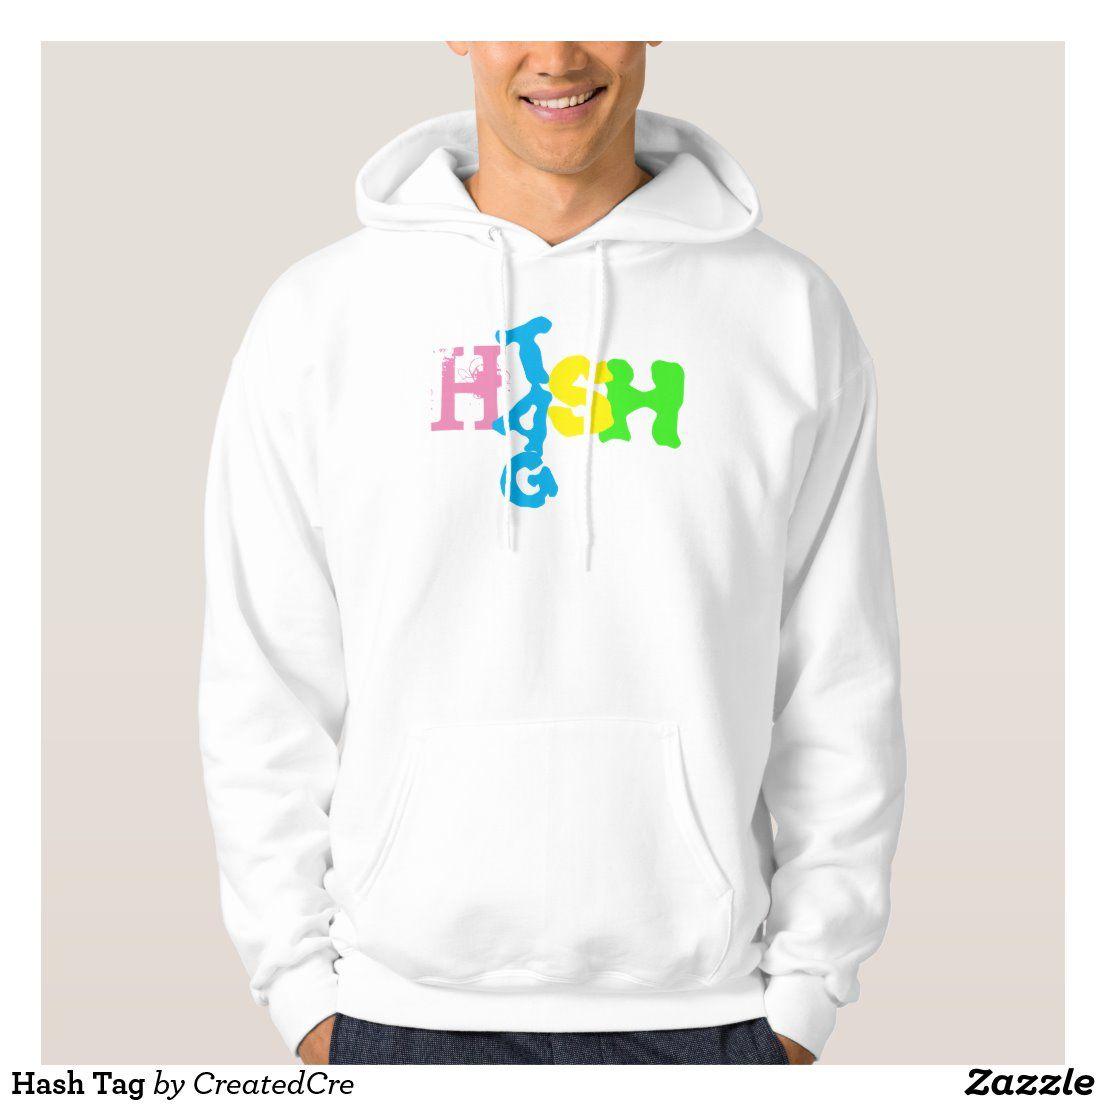 Hash Tag Sweatshirt Zazzle Com Hoodies Sweatshirts Gents T Shirts [ 1106 x 1106 Pixel ]